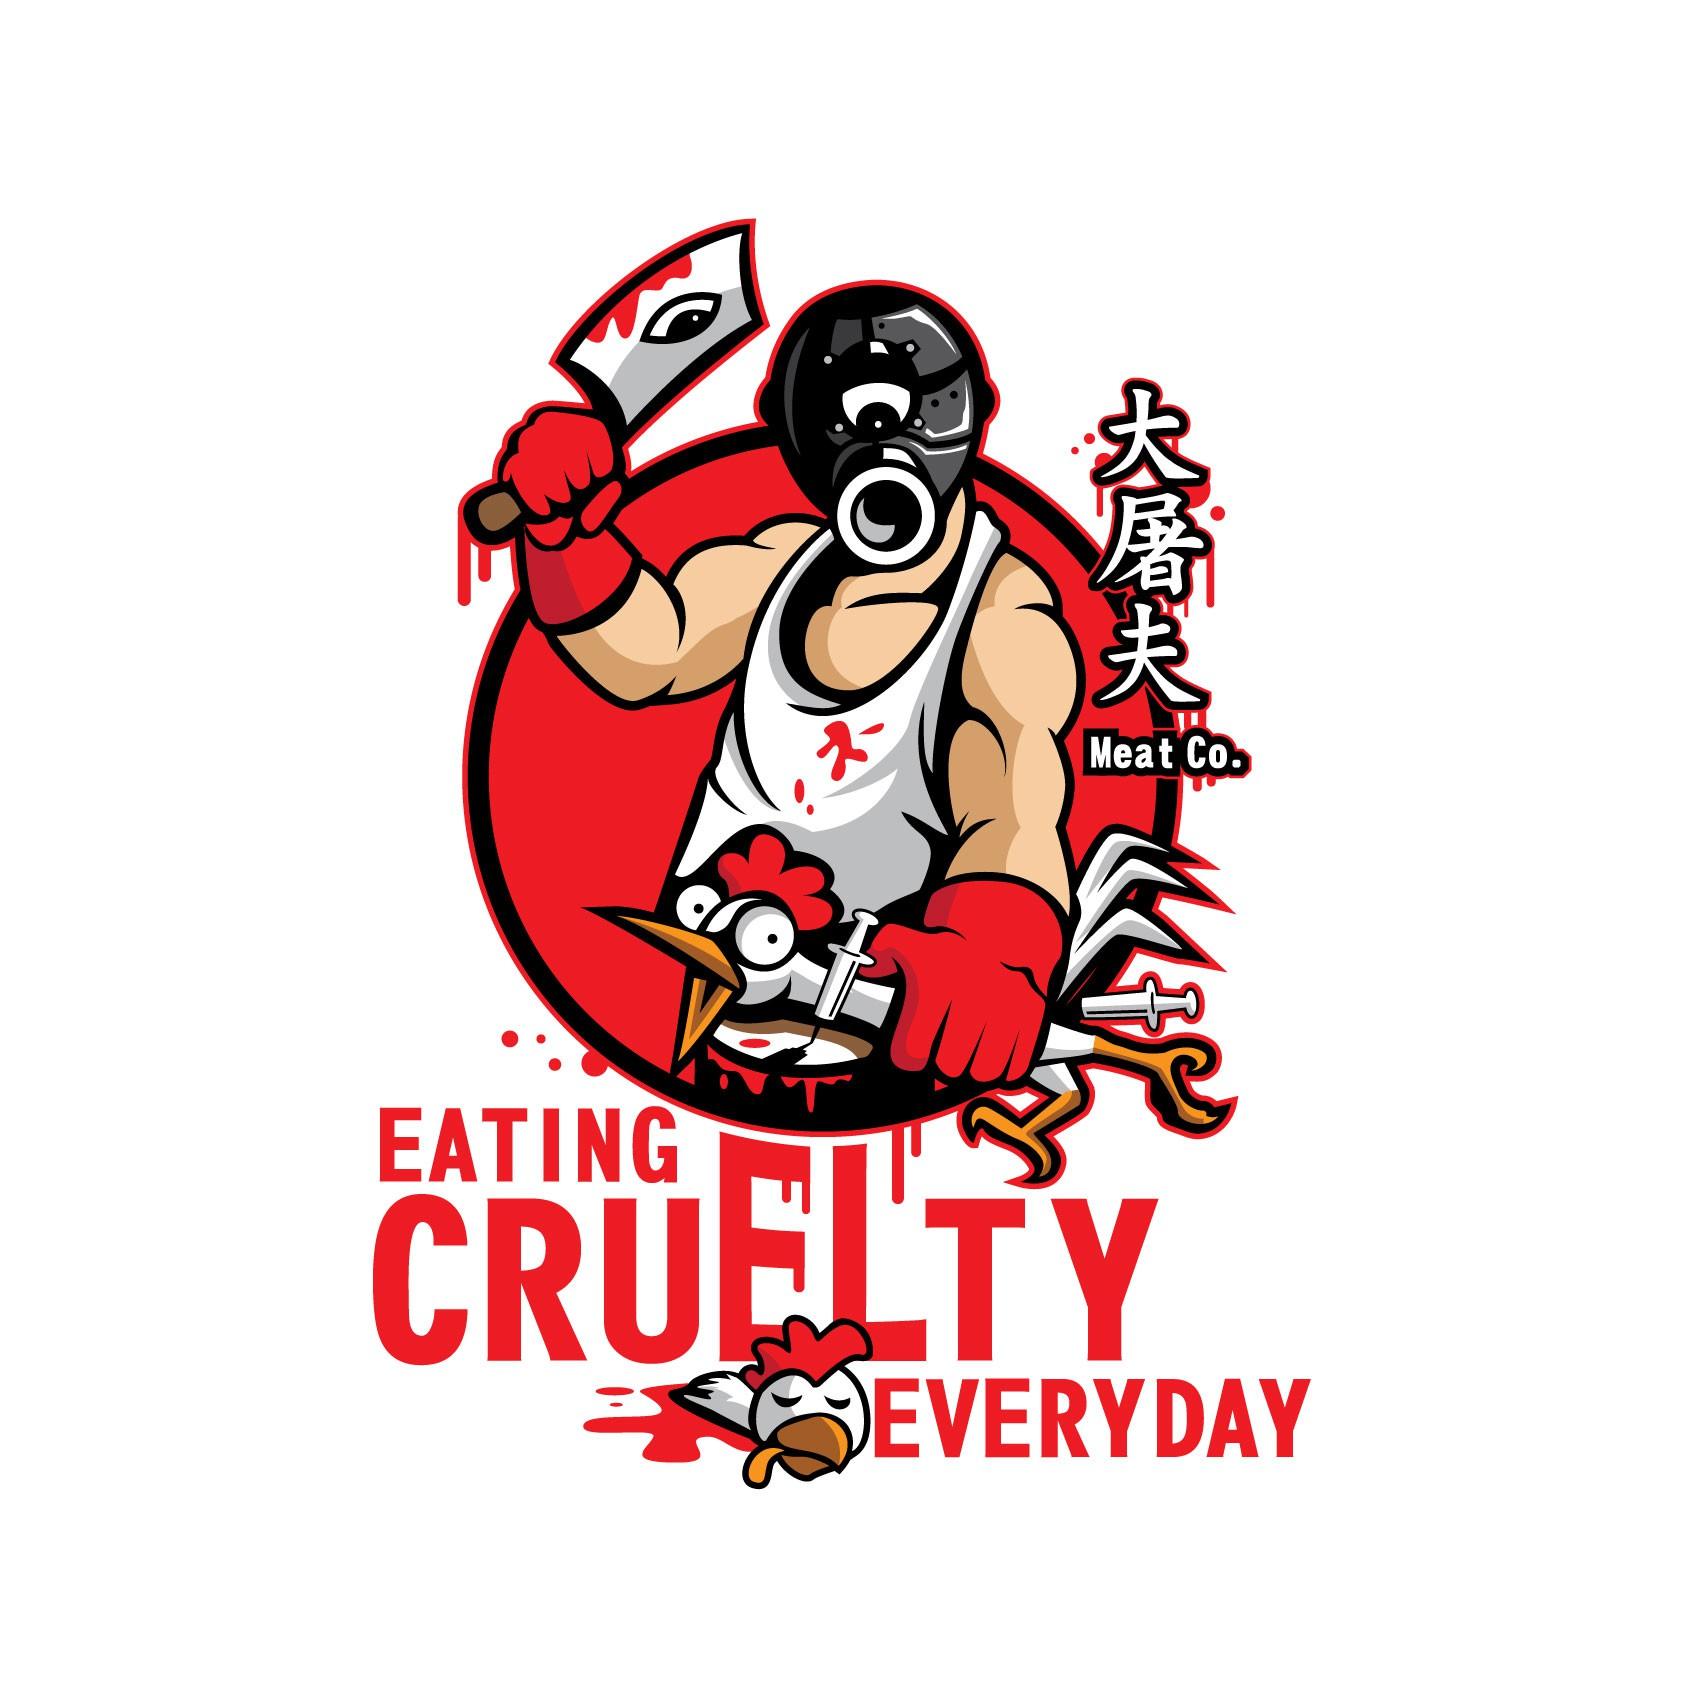 Eating Cruelty